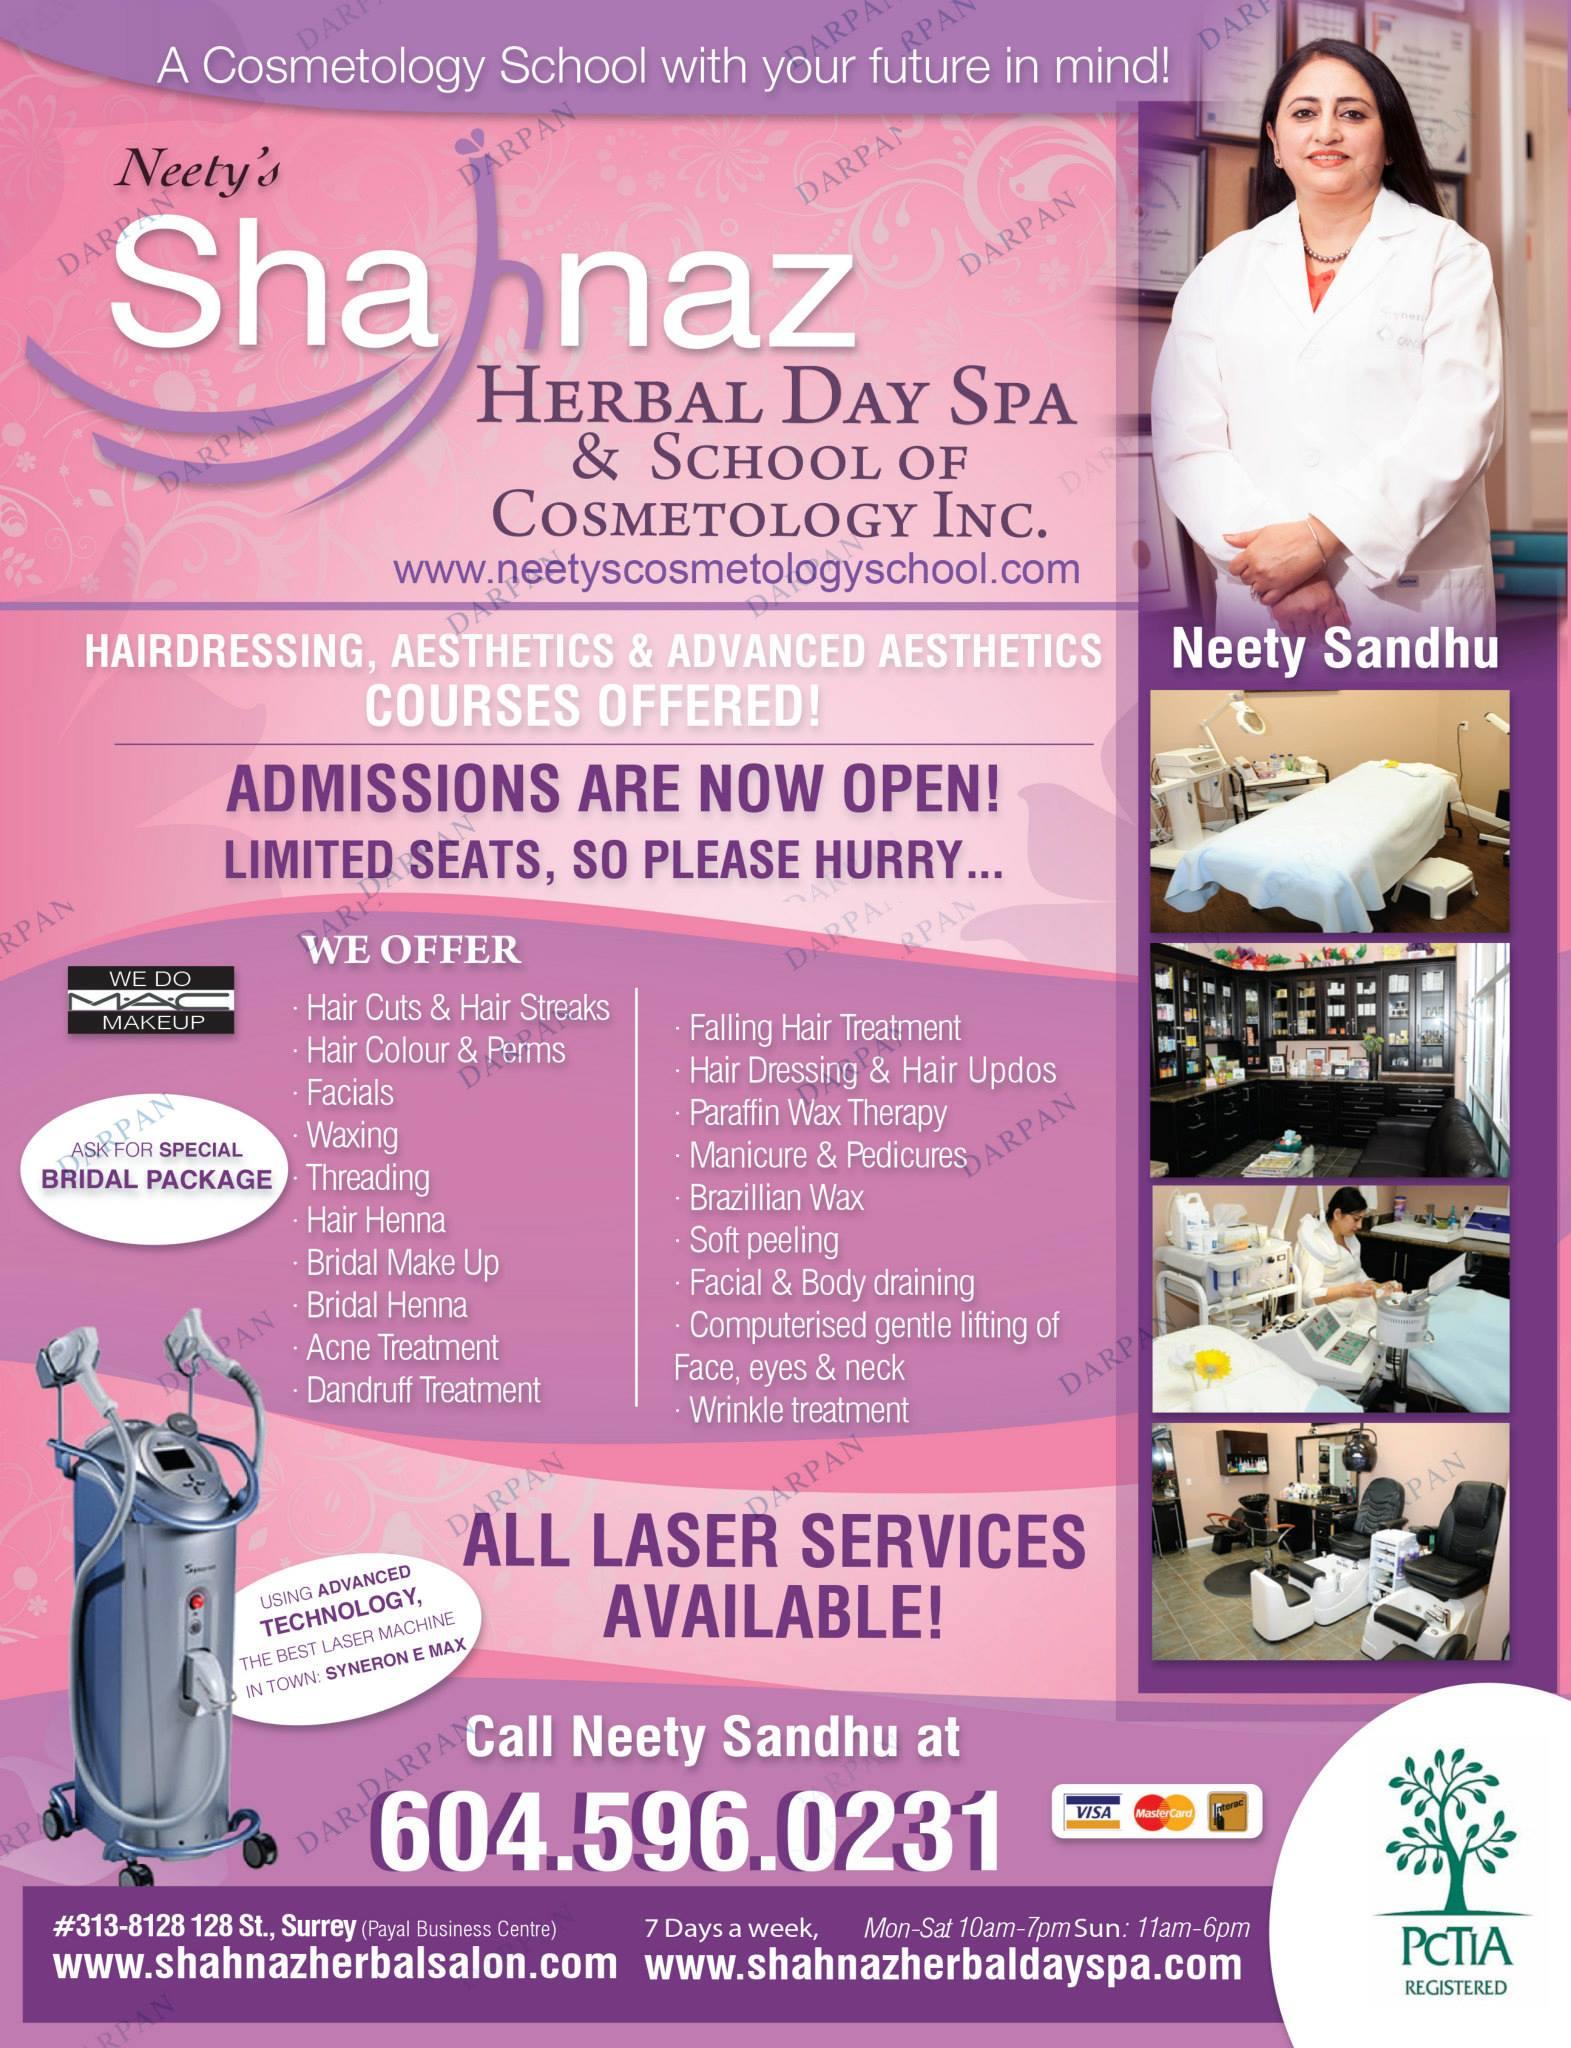 Shahnaz Herbal Day Spa